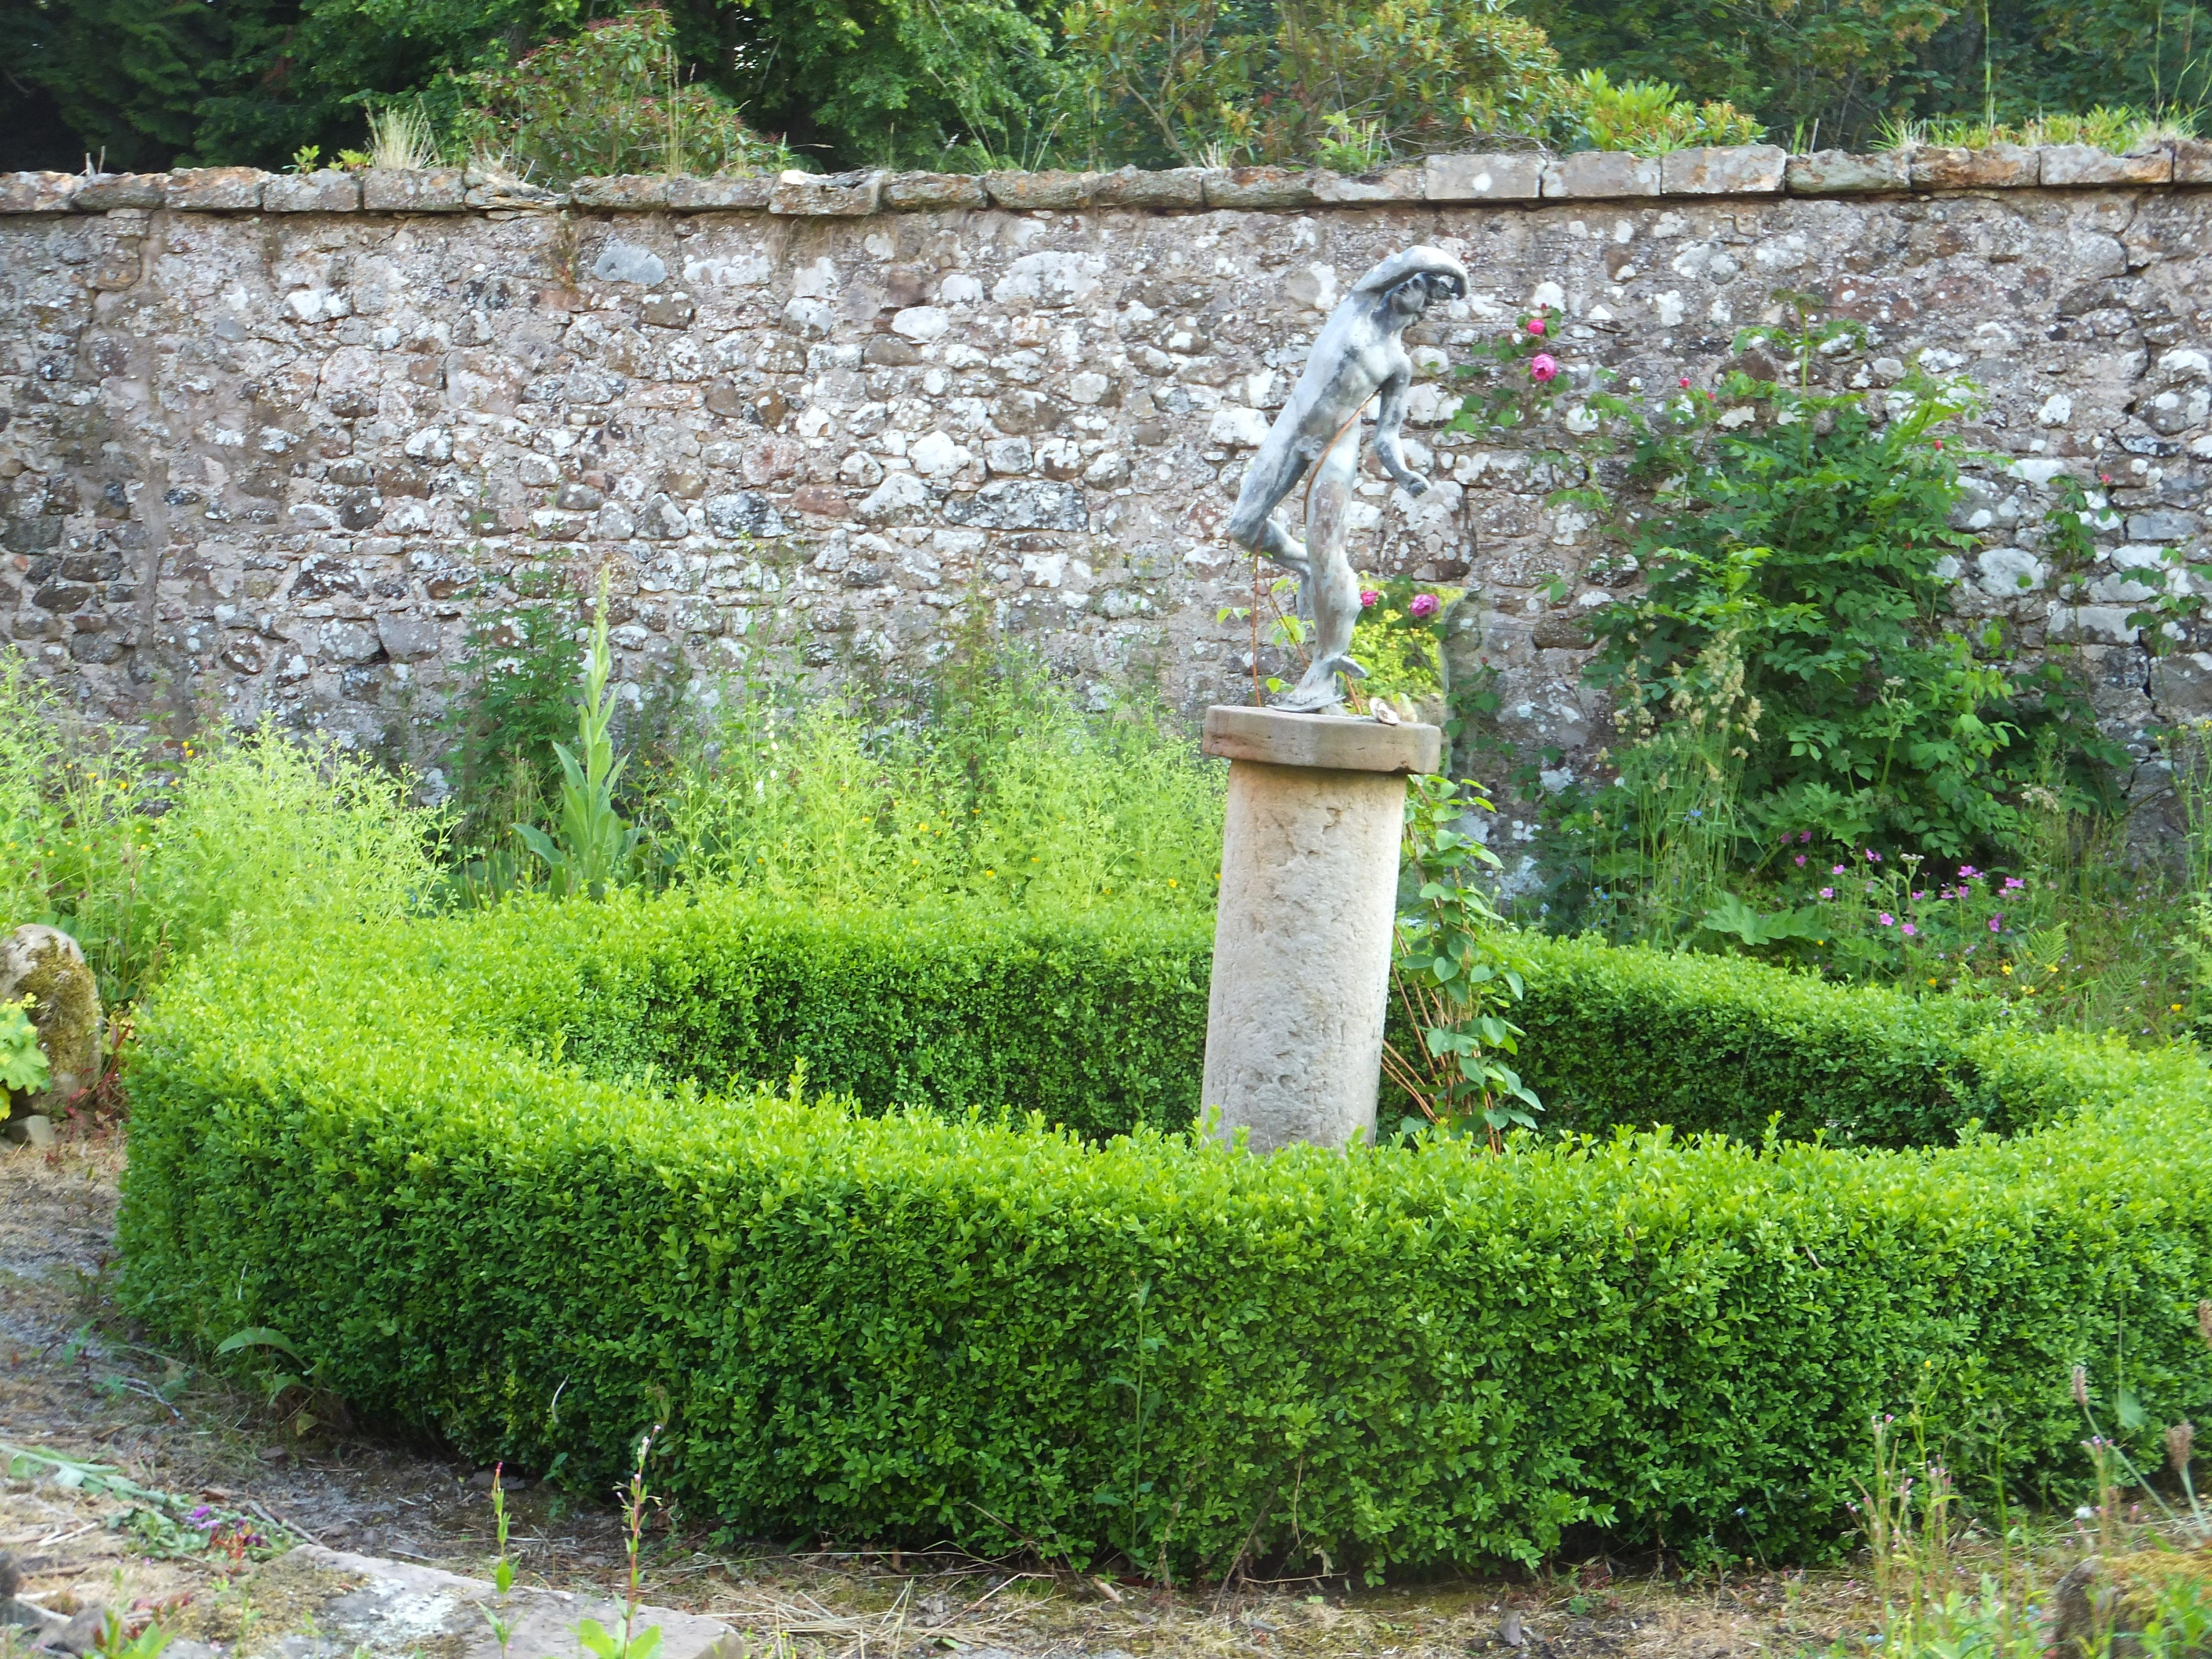 Physic garden wikipedia - Centre Of The Physic Garden